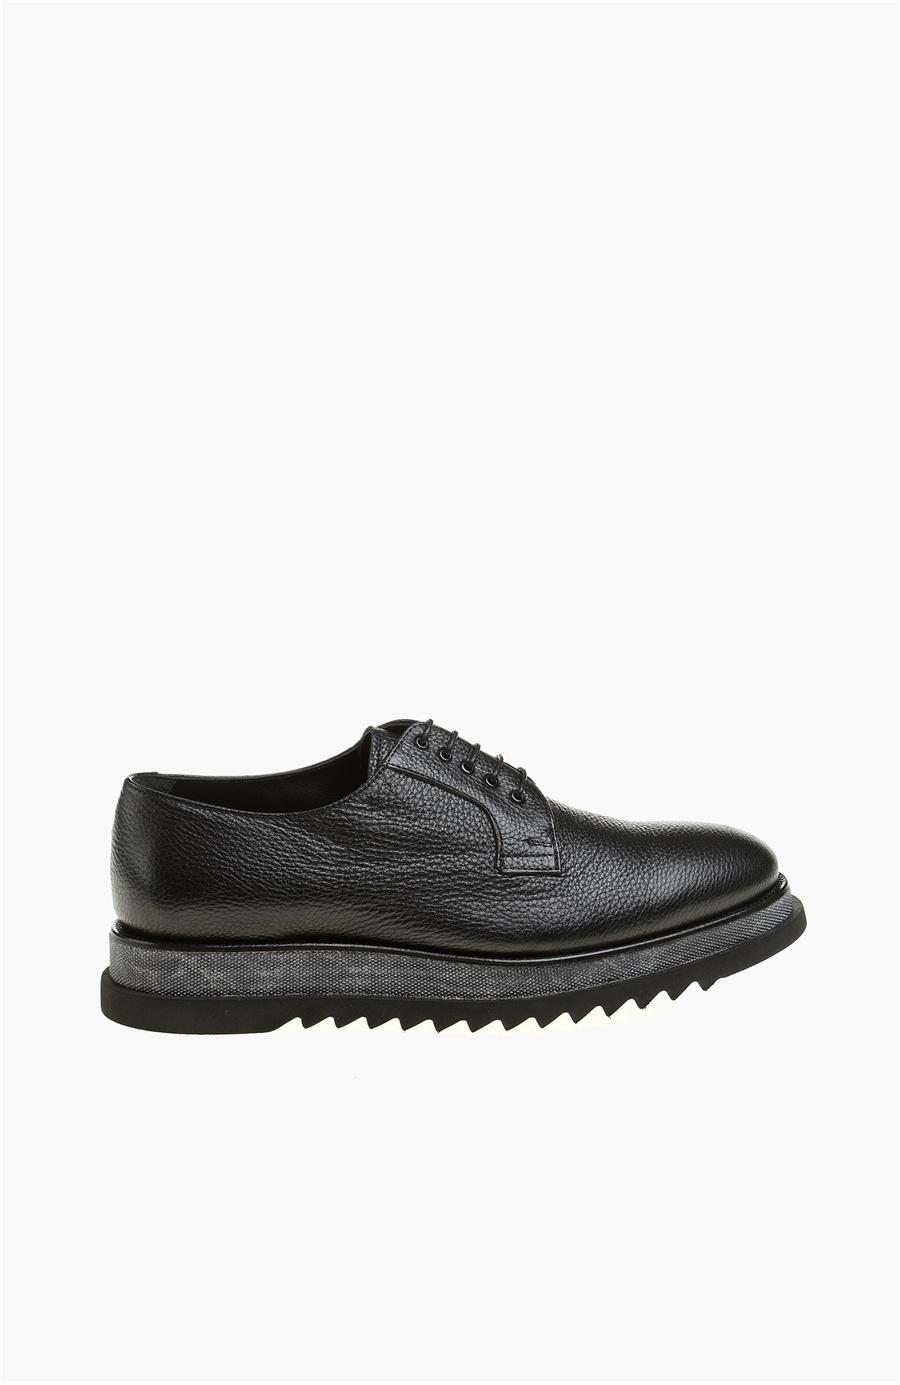 Siyah Eva Taban Ayakkabı - Renk Siyah - Network